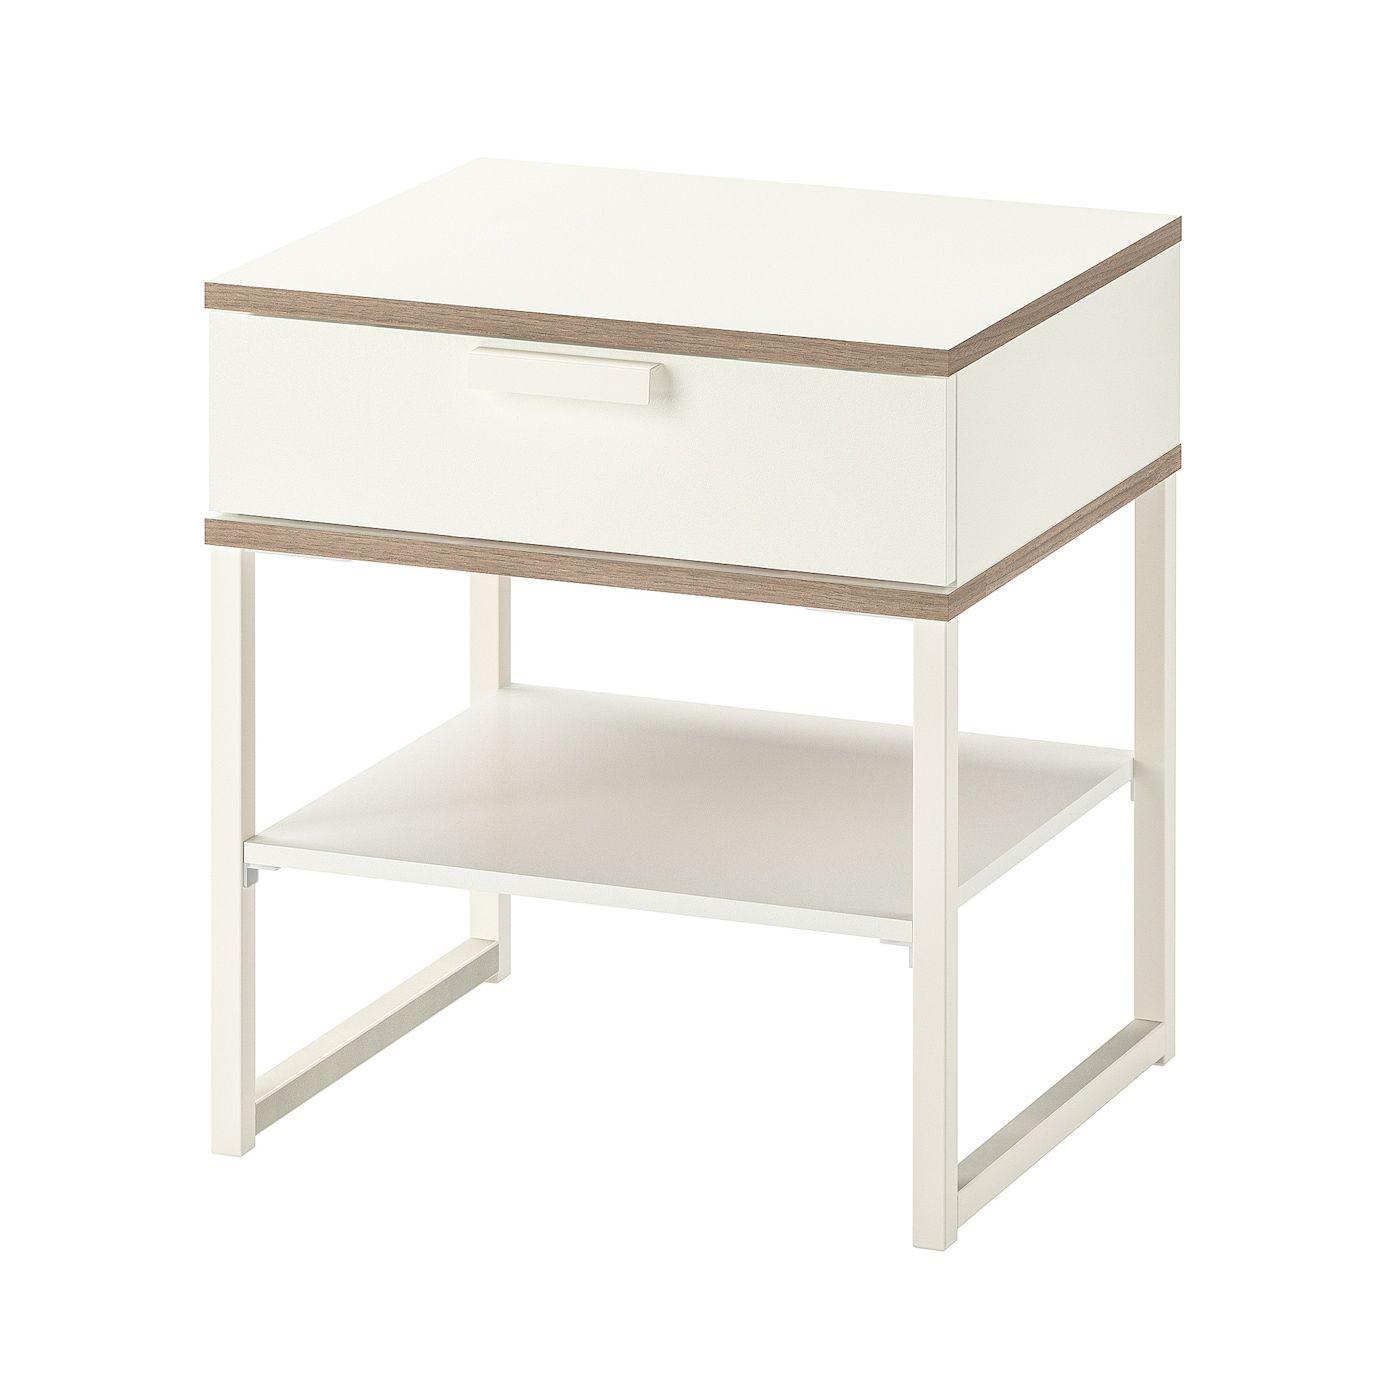 Trysil Avlastningsbord Vit Ljusgra 45x40 Cm Ikea Bedside Table Ikea Ikea Trysil White Bedside Table [ 1400 x 1400 Pixel ]